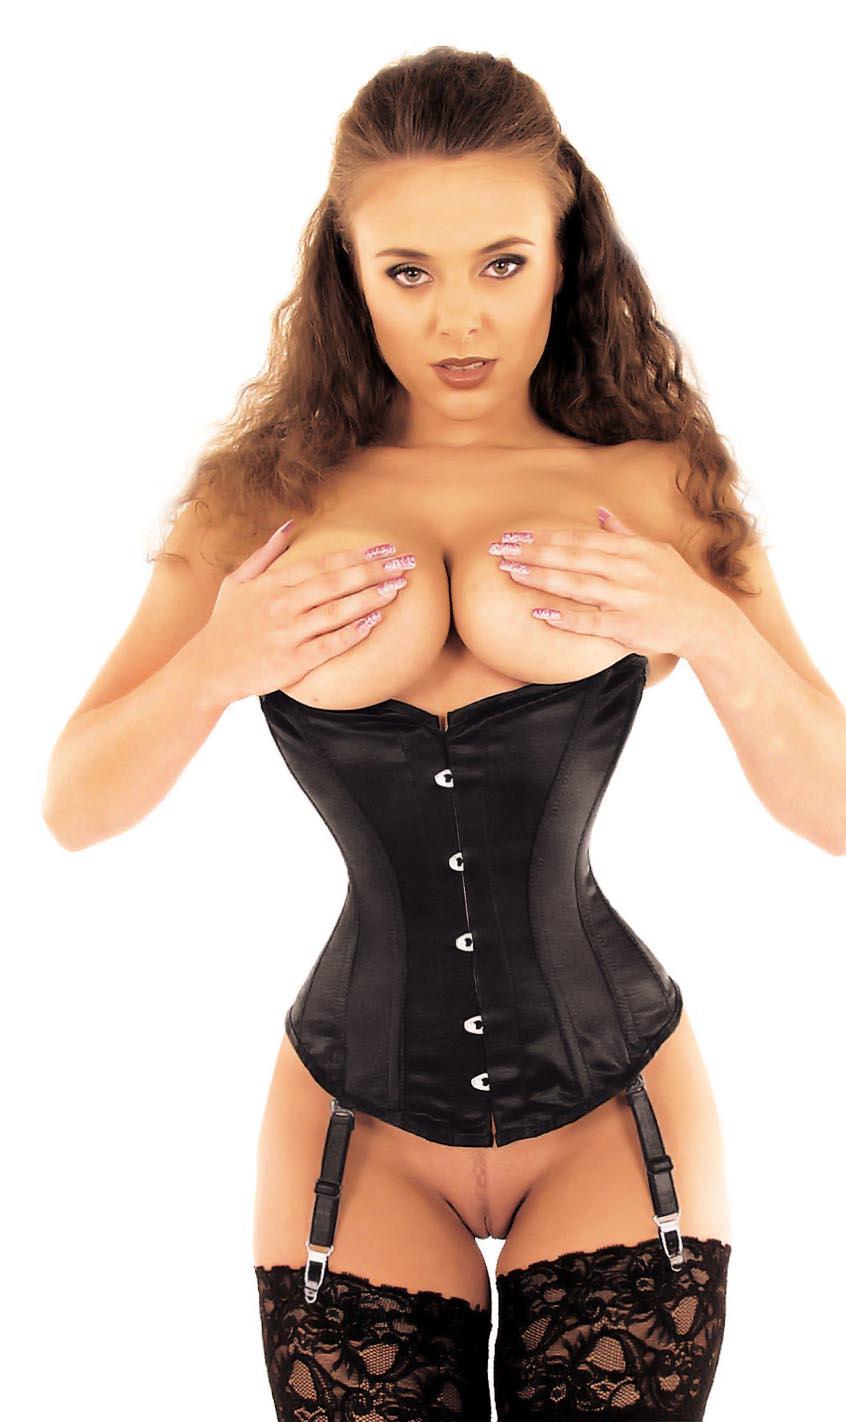 sexy+tight+corset+(49).jpg